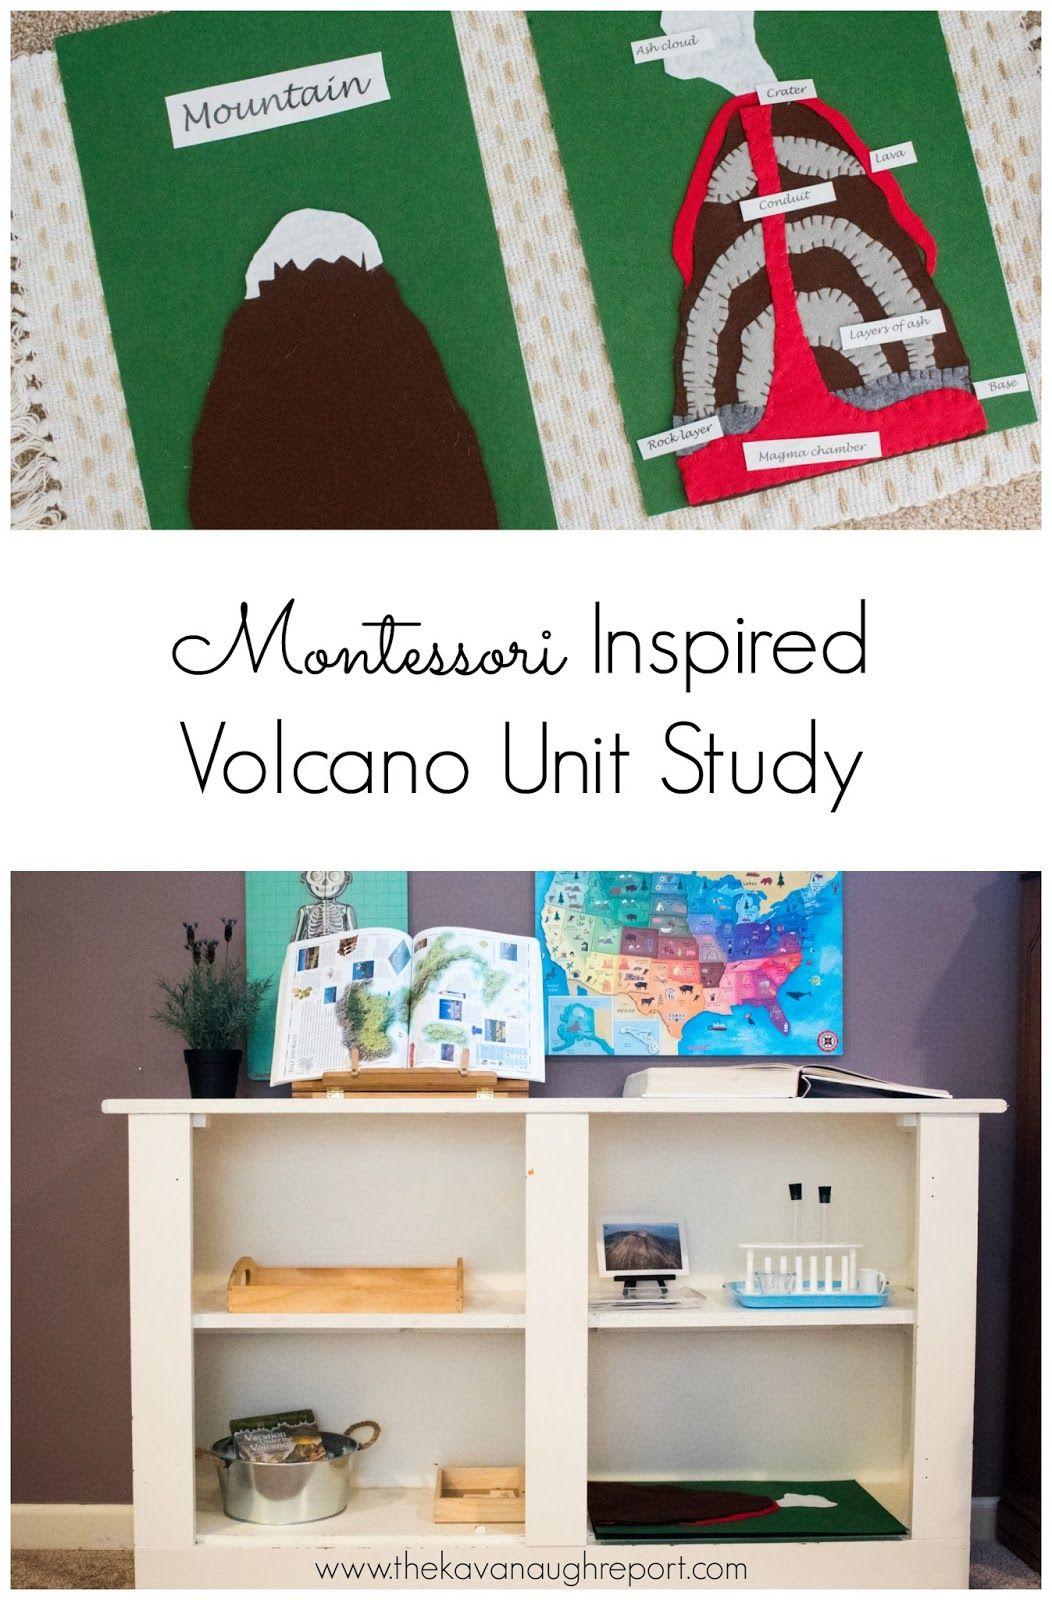 A Montessori Inspired Volcano Unit Study This Small Study Includes Some Montessor Kindergarten Lesson Plans Montessori Science Montessori Activities Preschool [ 1600 x 1052 Pixel ]